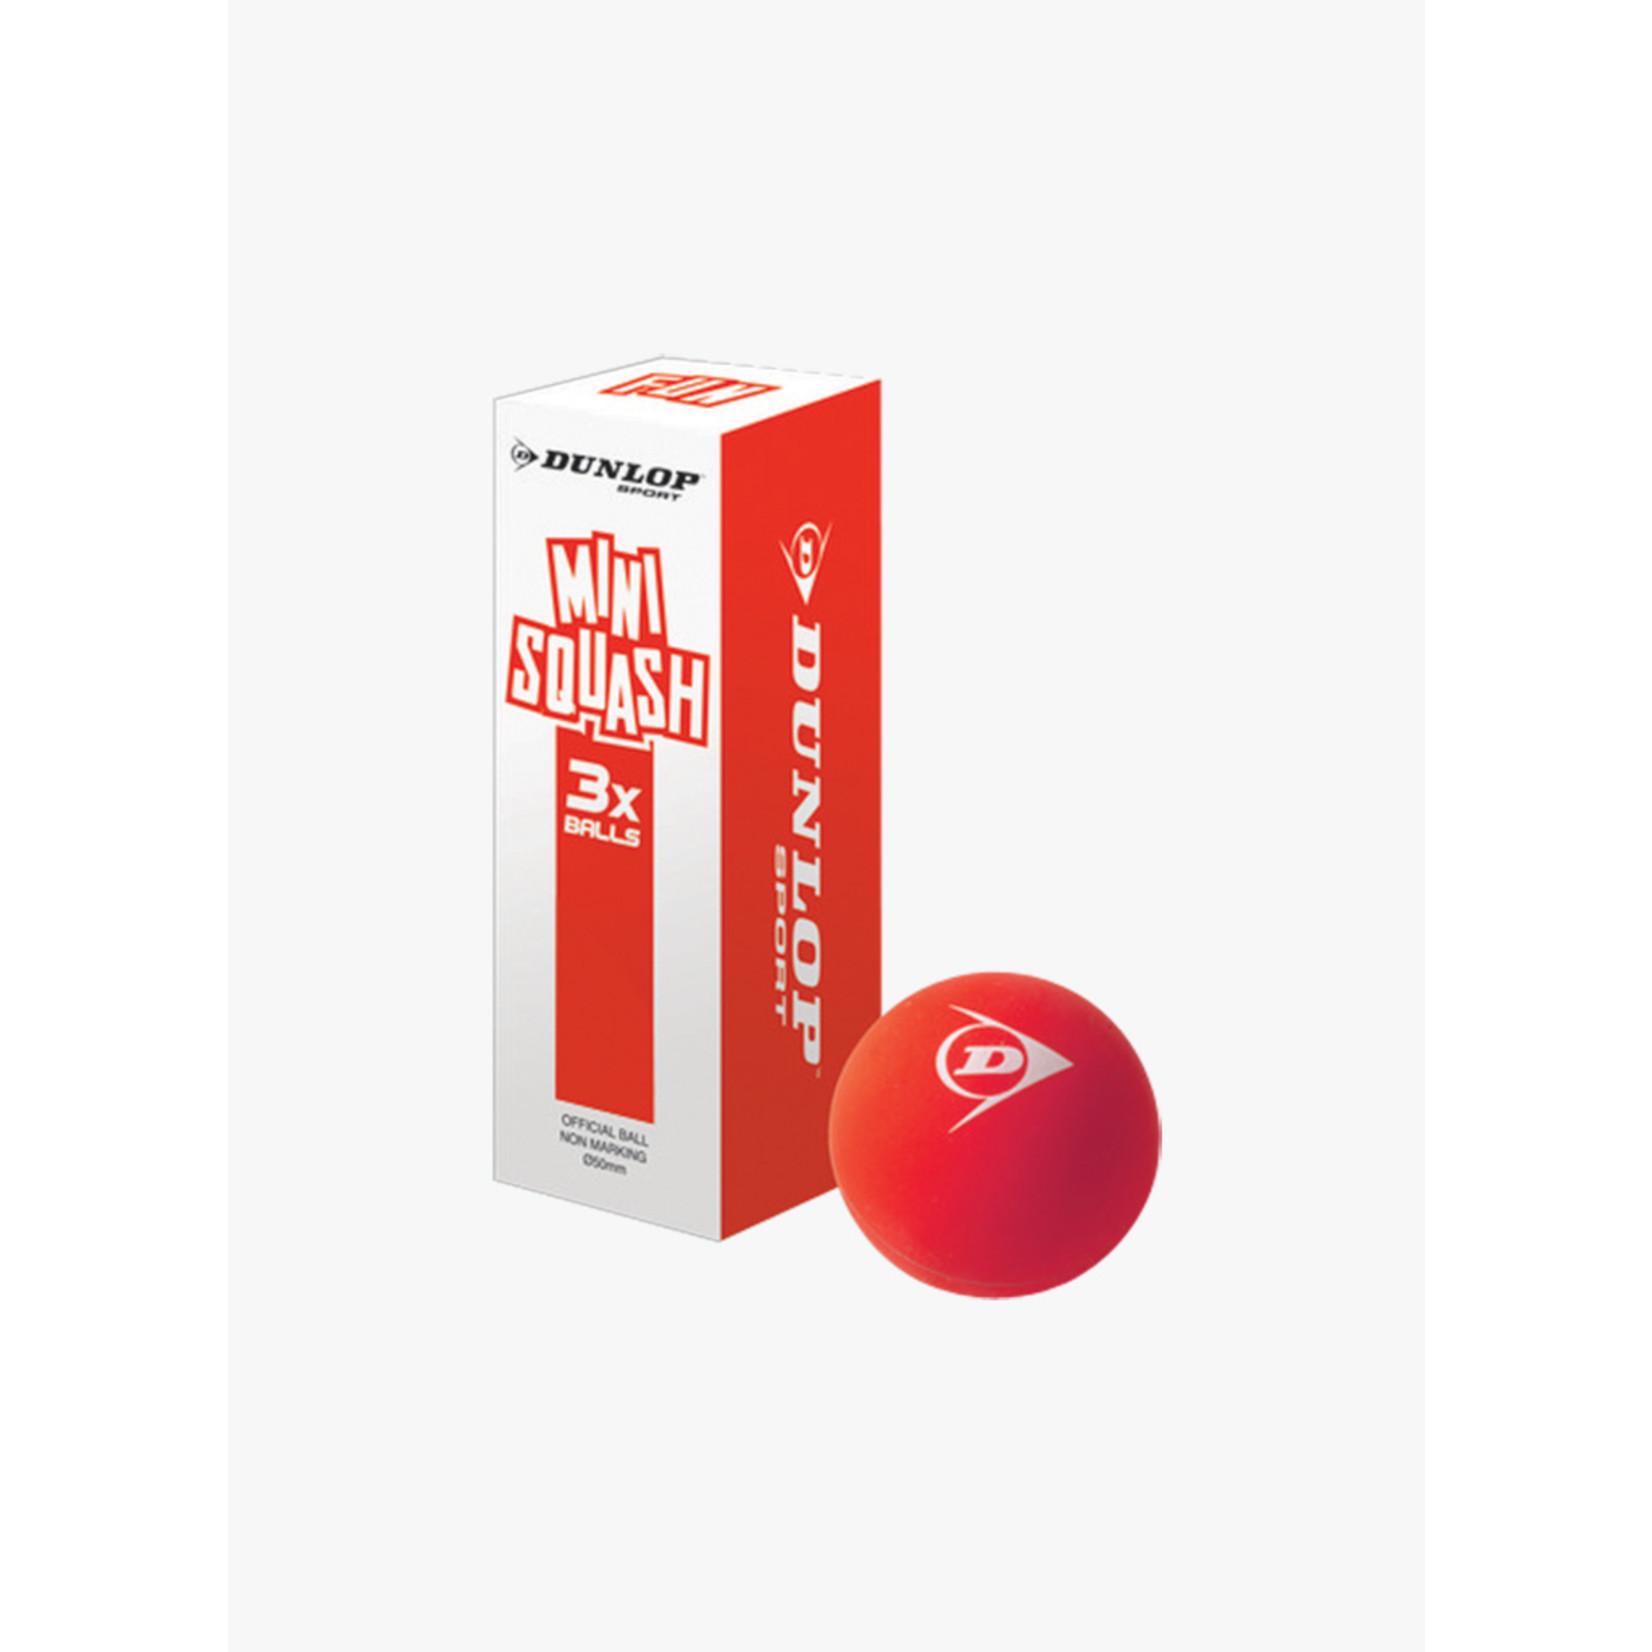 Dunlop Fun Mini Squashbal Orange 3pk